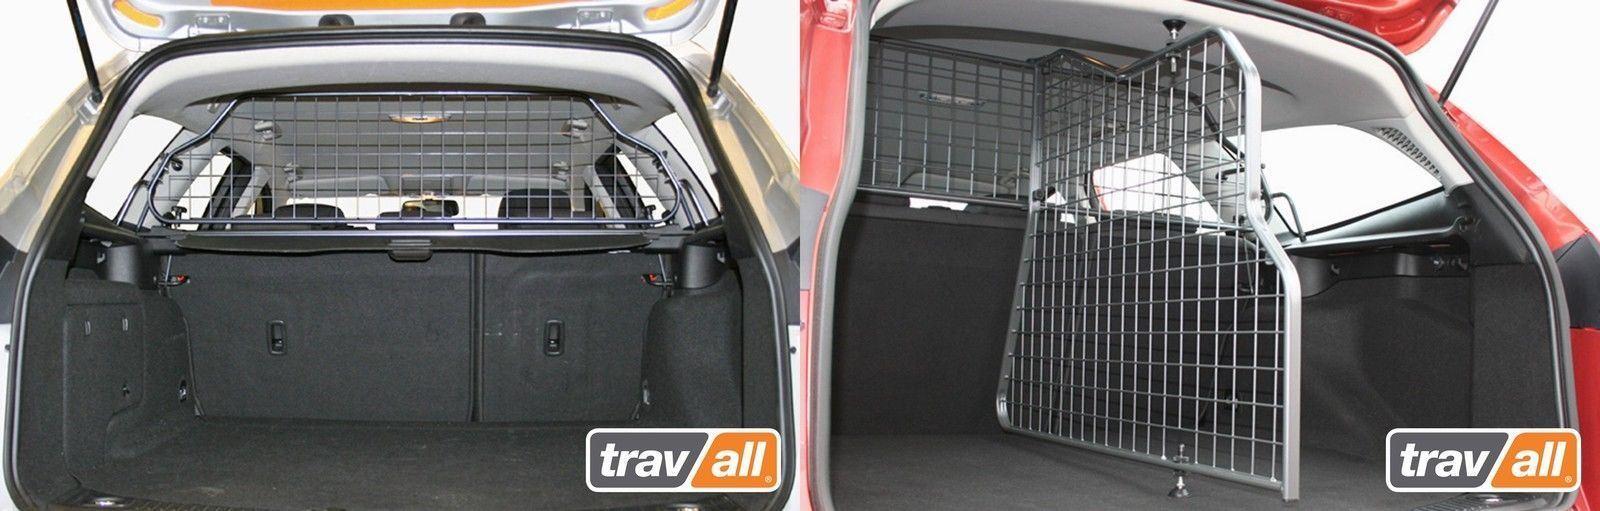 FORD MONDEO ESTATE TRAVALL DOG GUARD DIVIDER 2007-2014